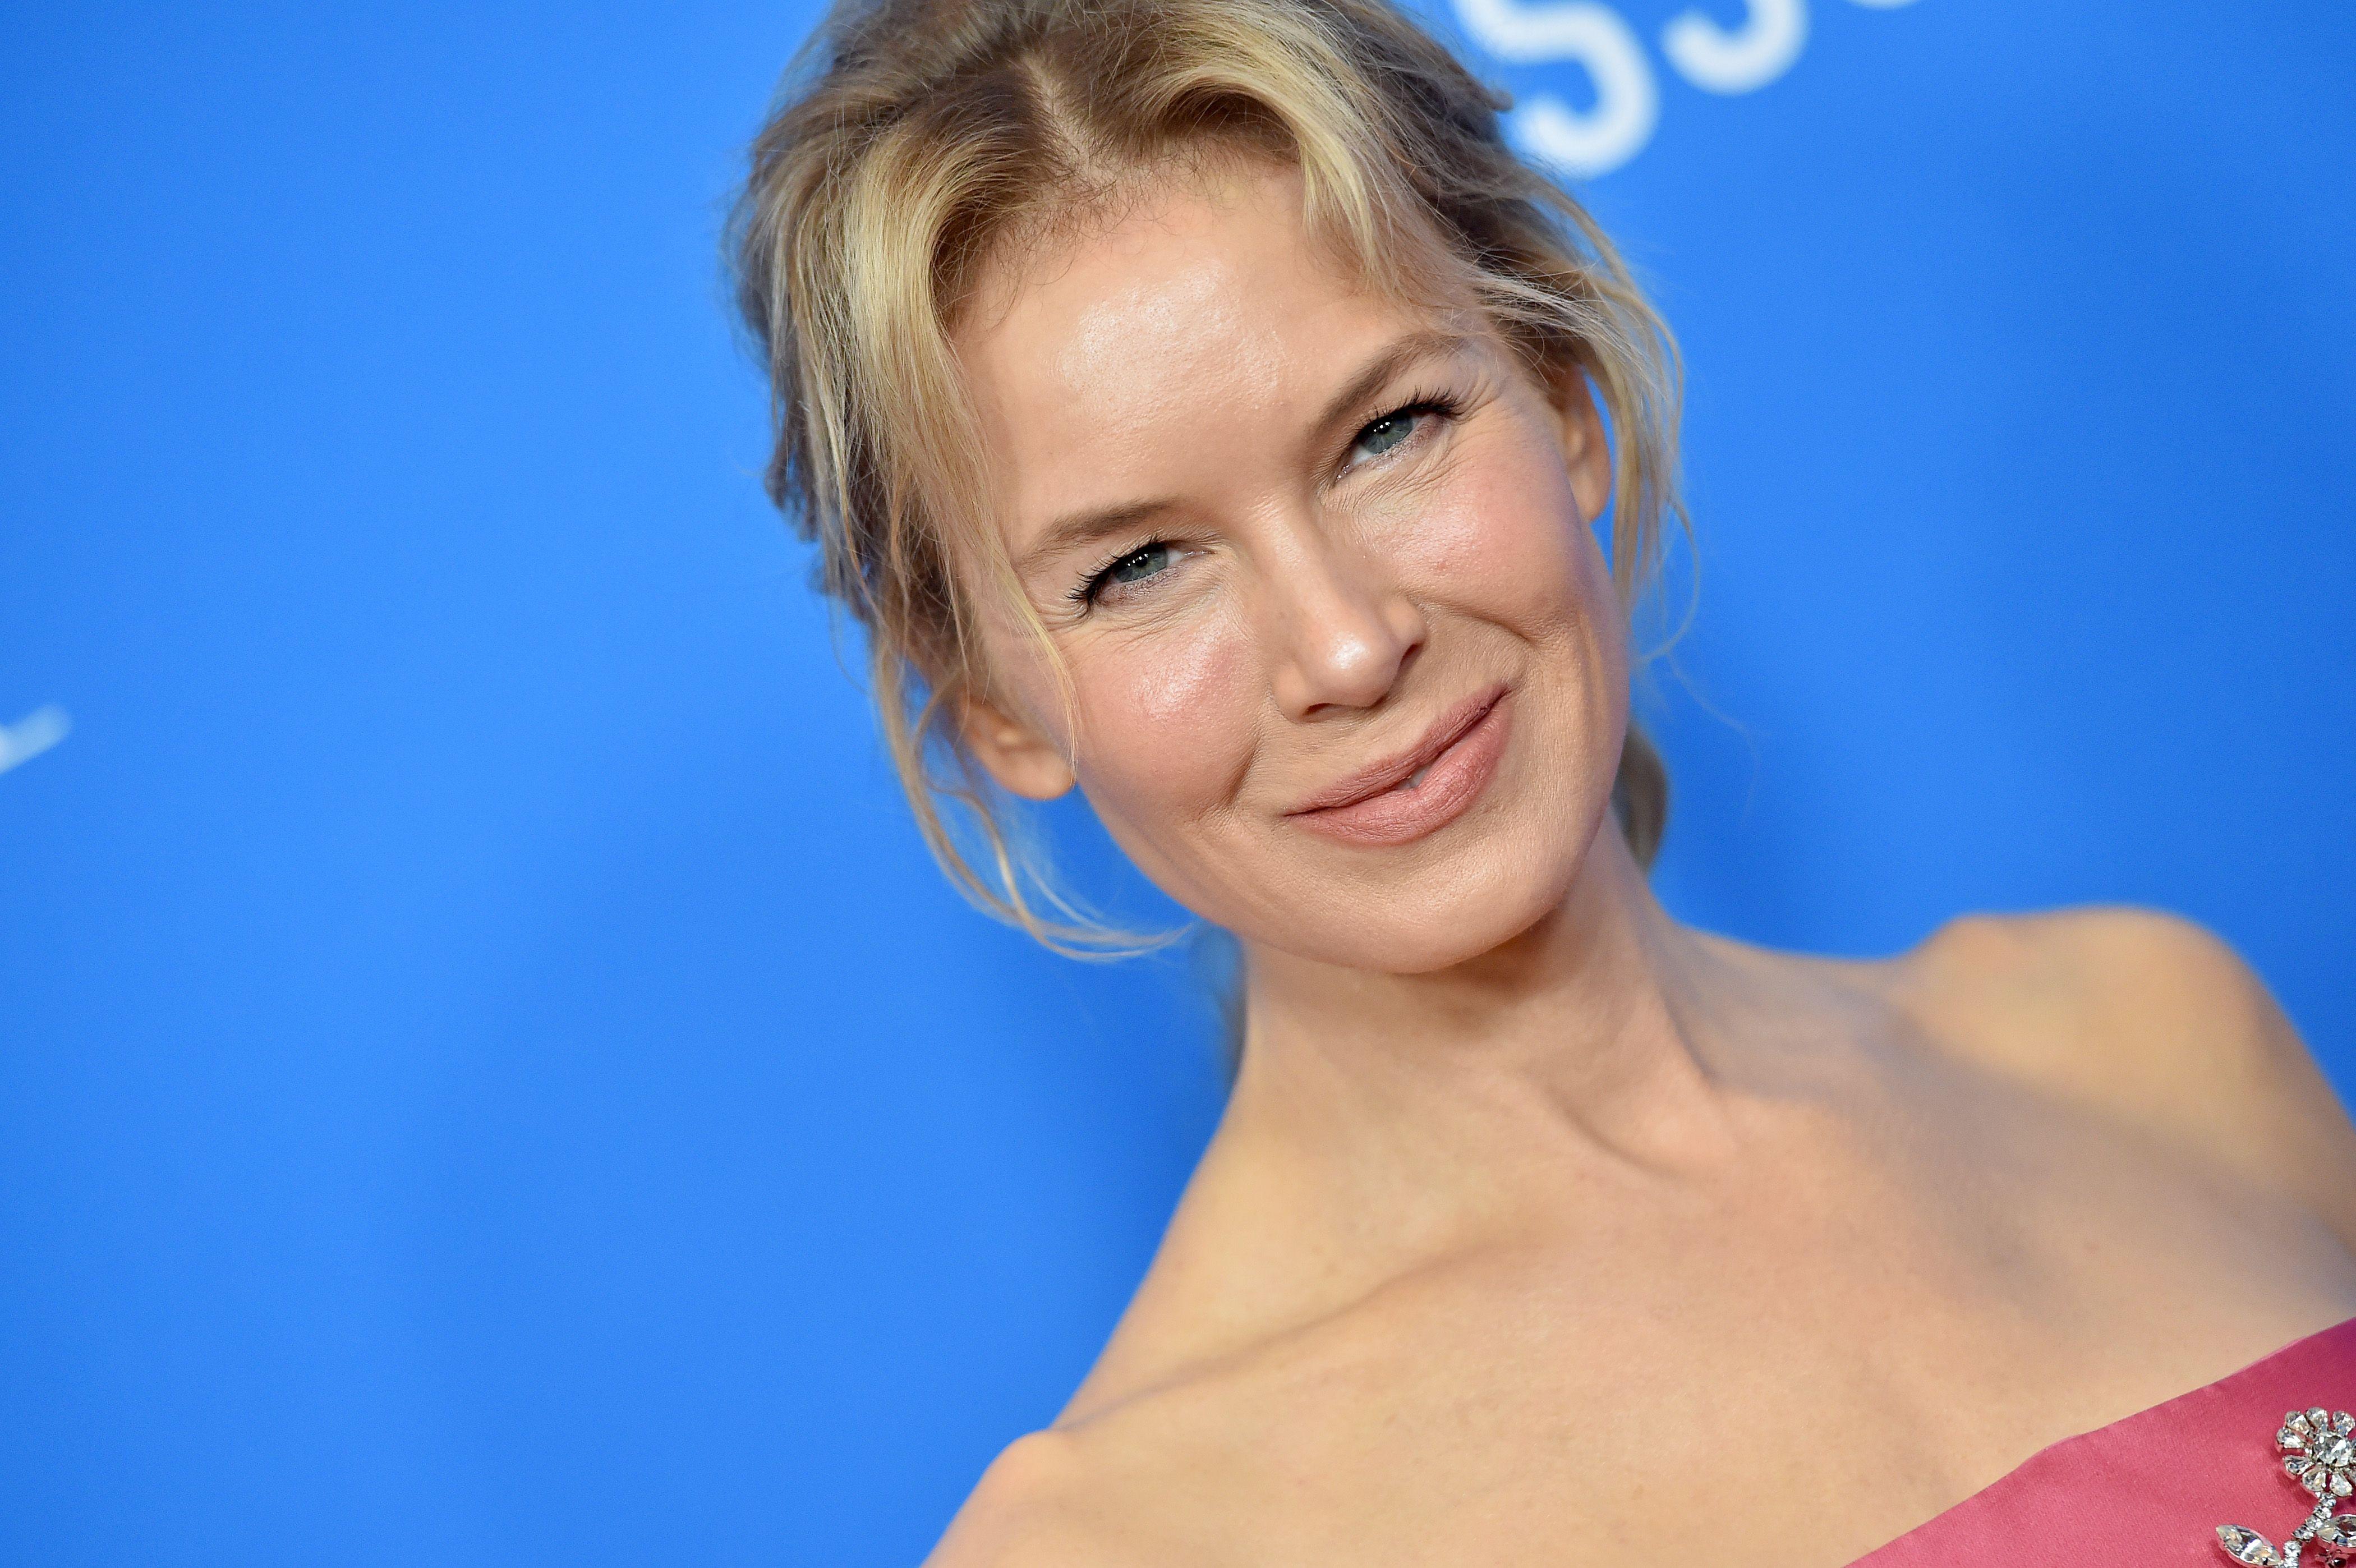 Renée Zellweger recalls overhearing strangers say she was 'stupid'